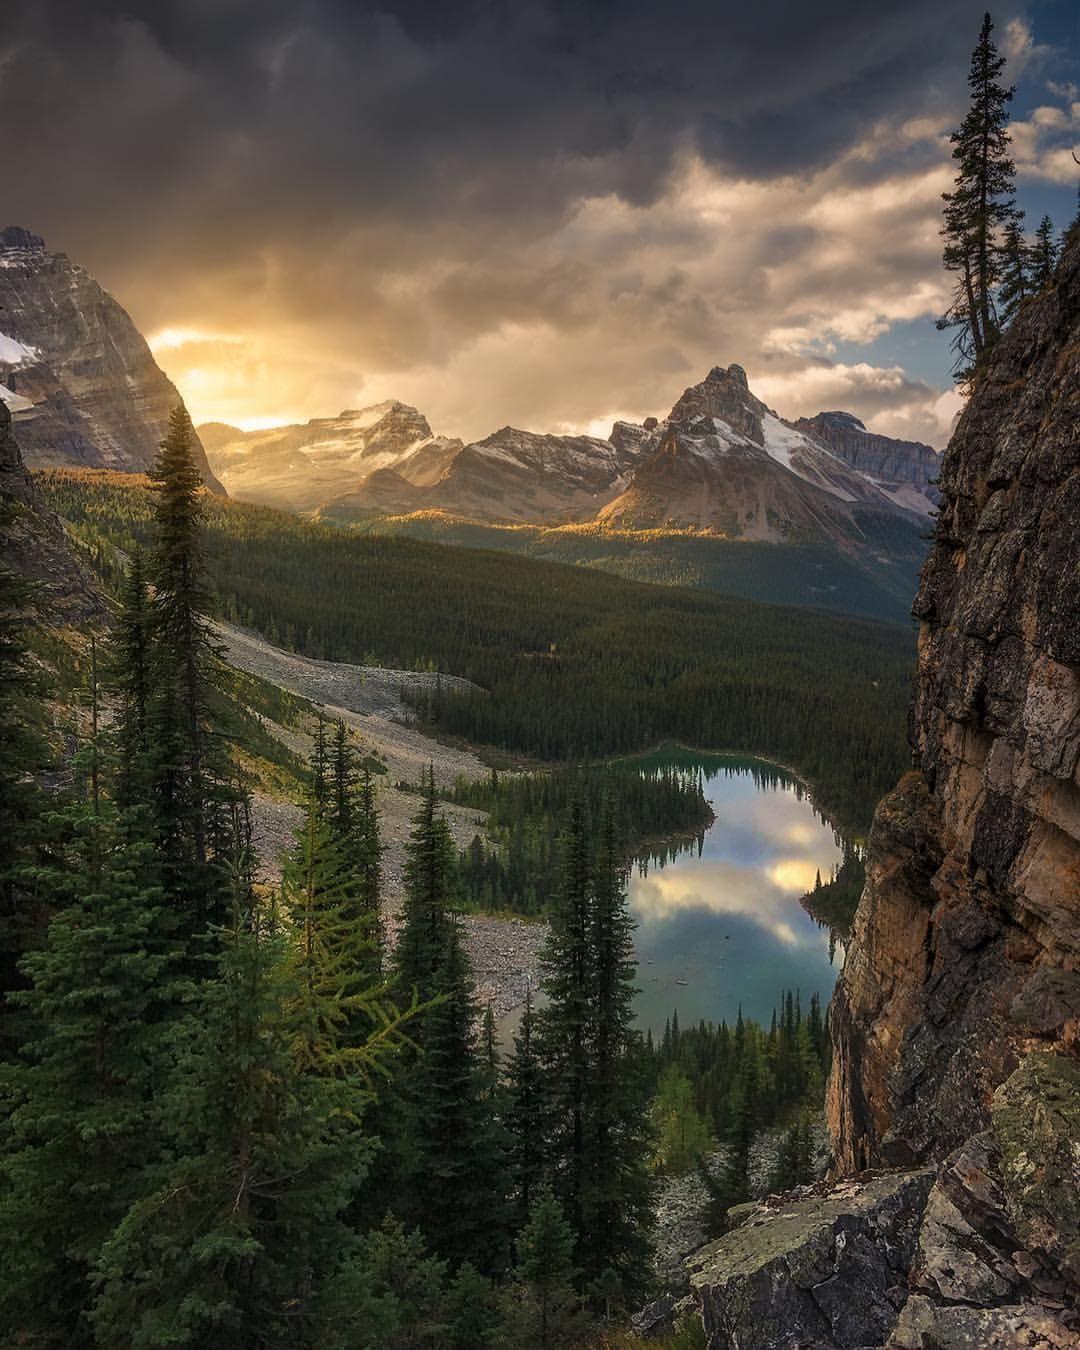 Stunning Nature Nature Photography Landscape Photography Scenery